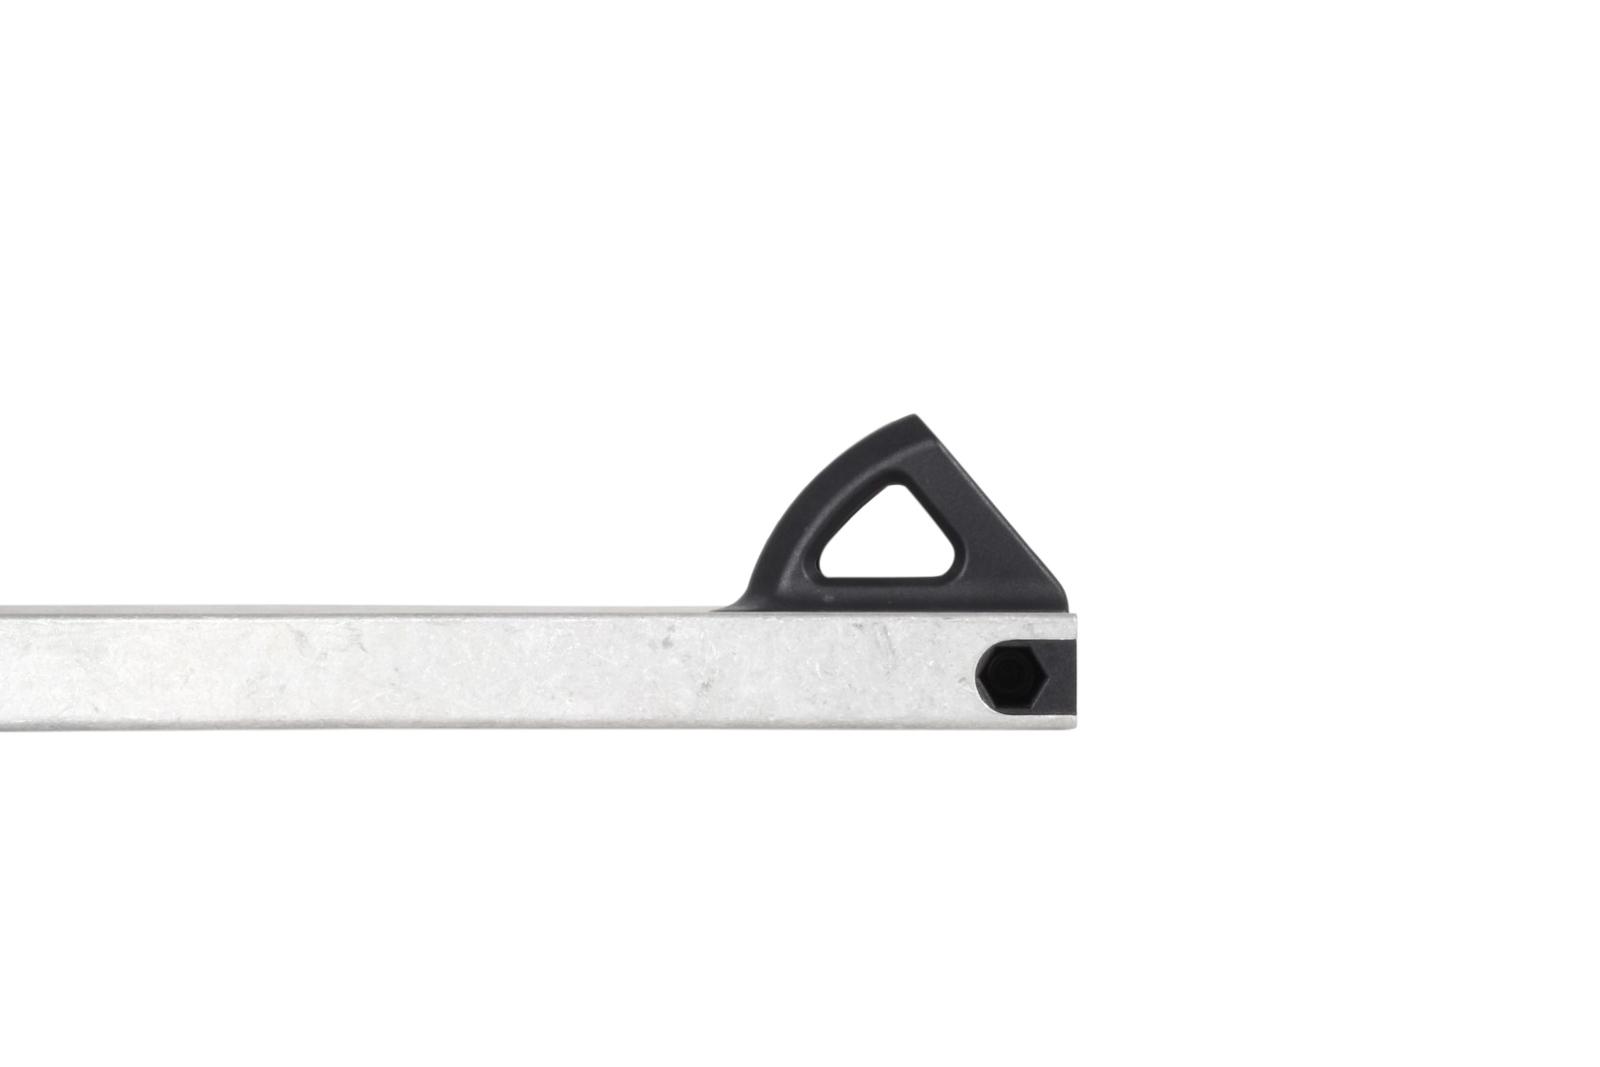 Дека Native Stem Deck Small 20.5x5.25 Raw